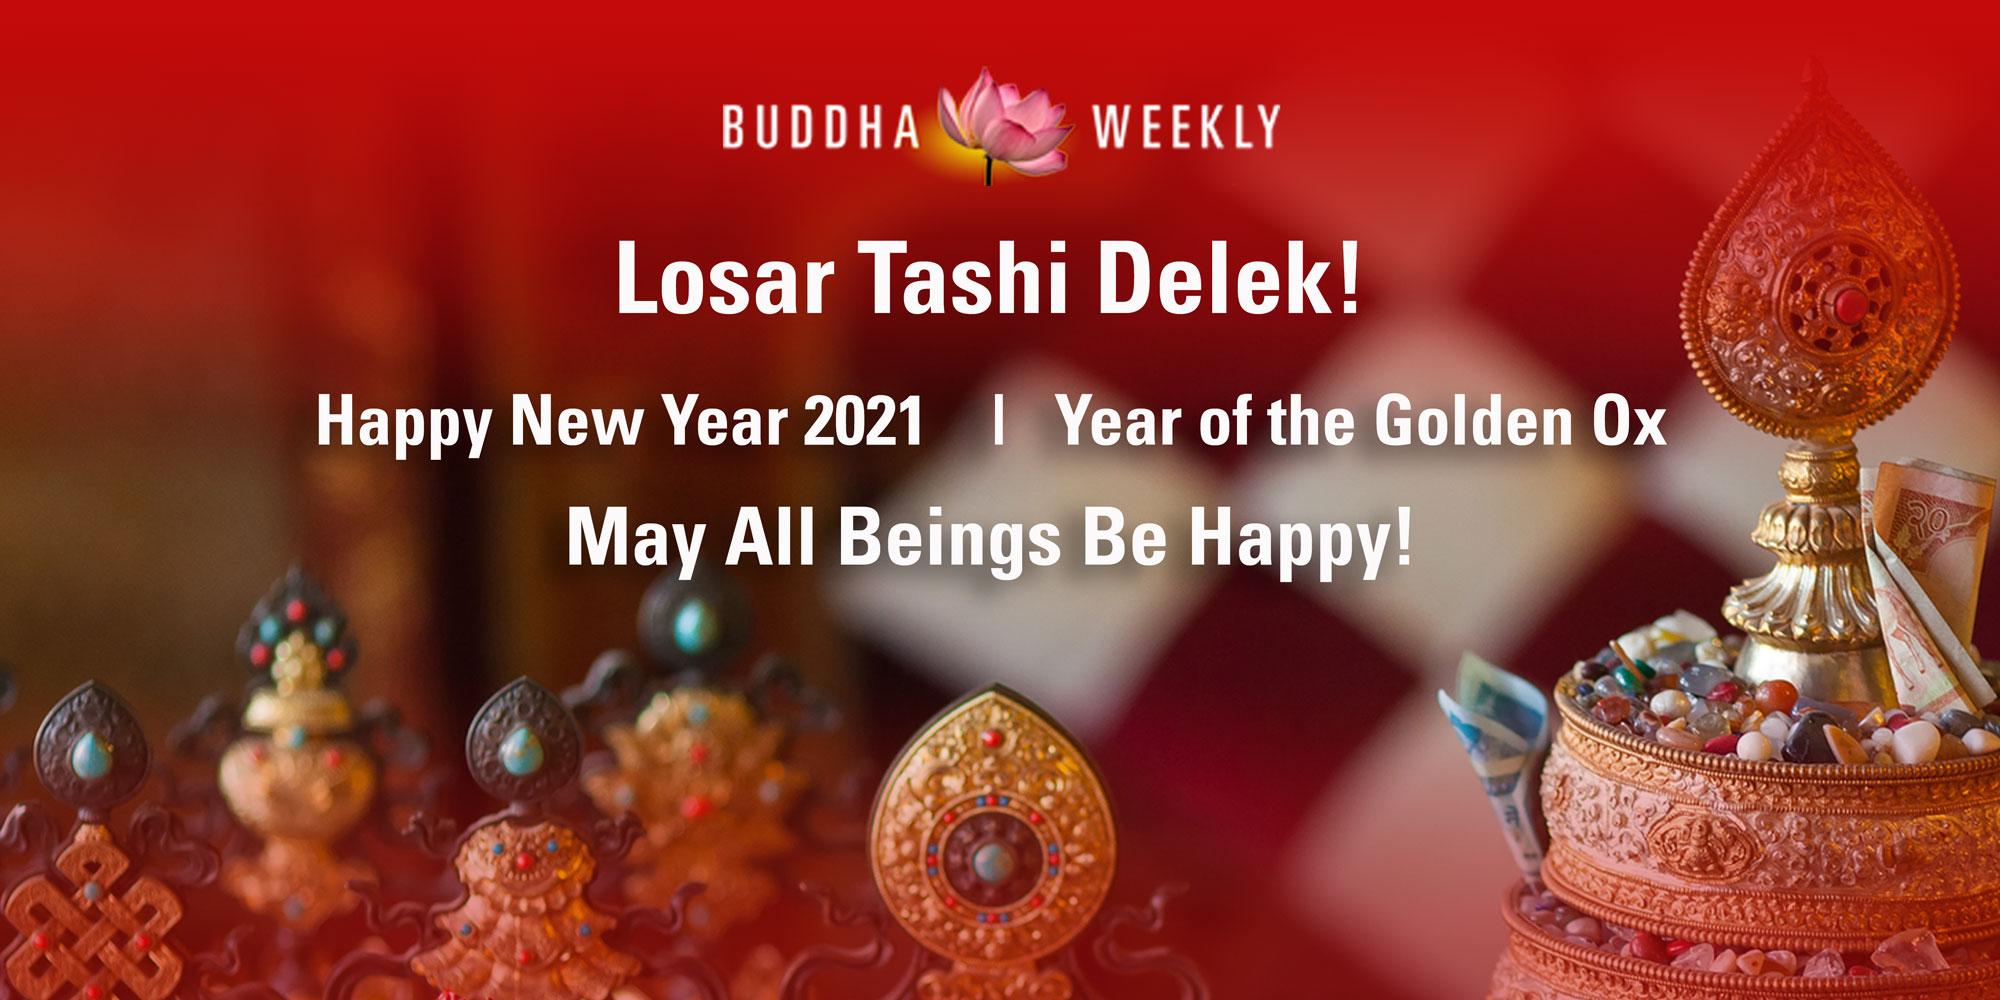 BUDDHA WEEKLY tibetan NEW YEAR 2021